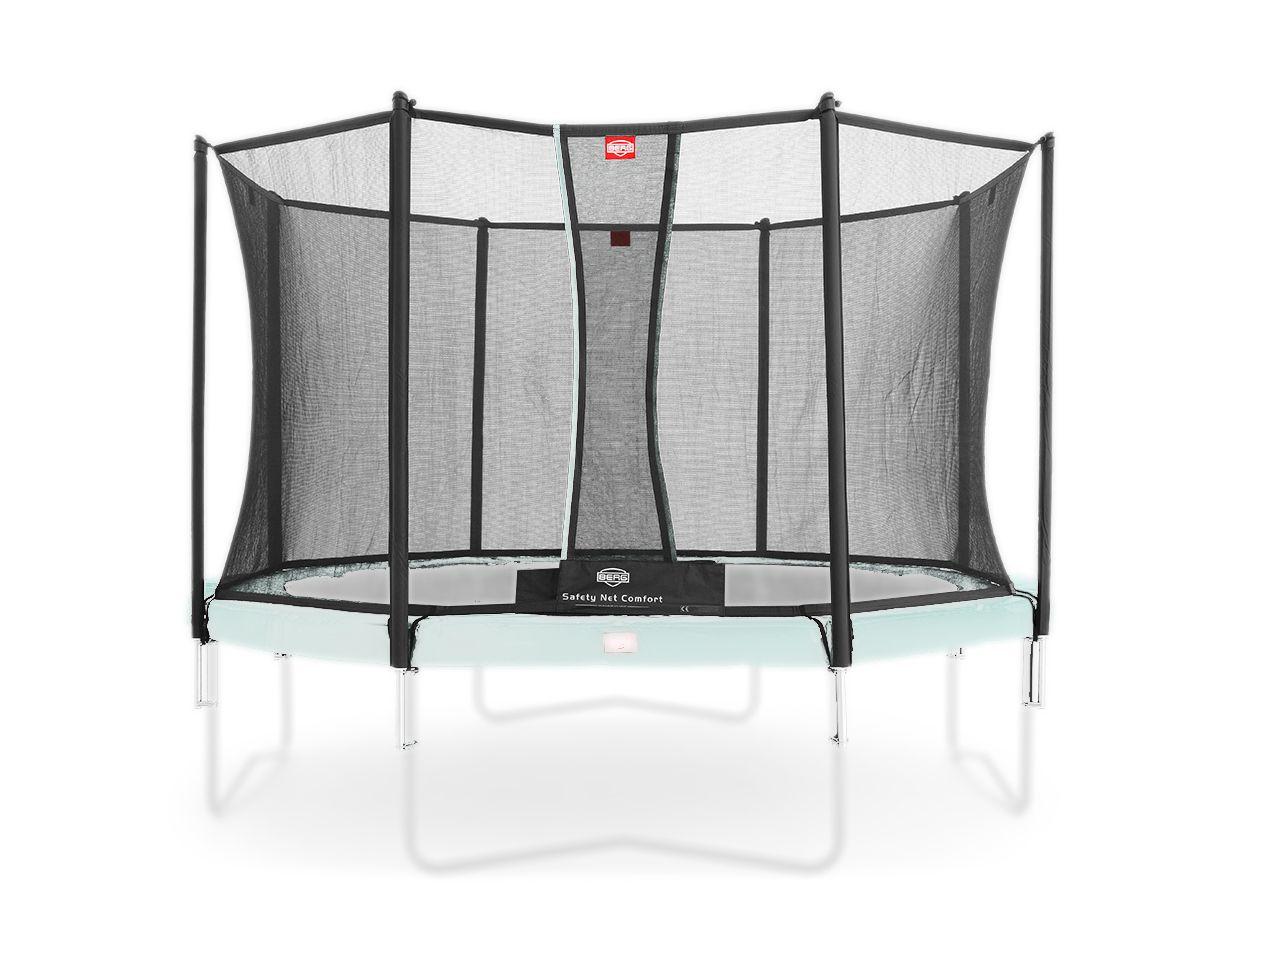 BERG Safety Net Comfort 330 (11 ft)